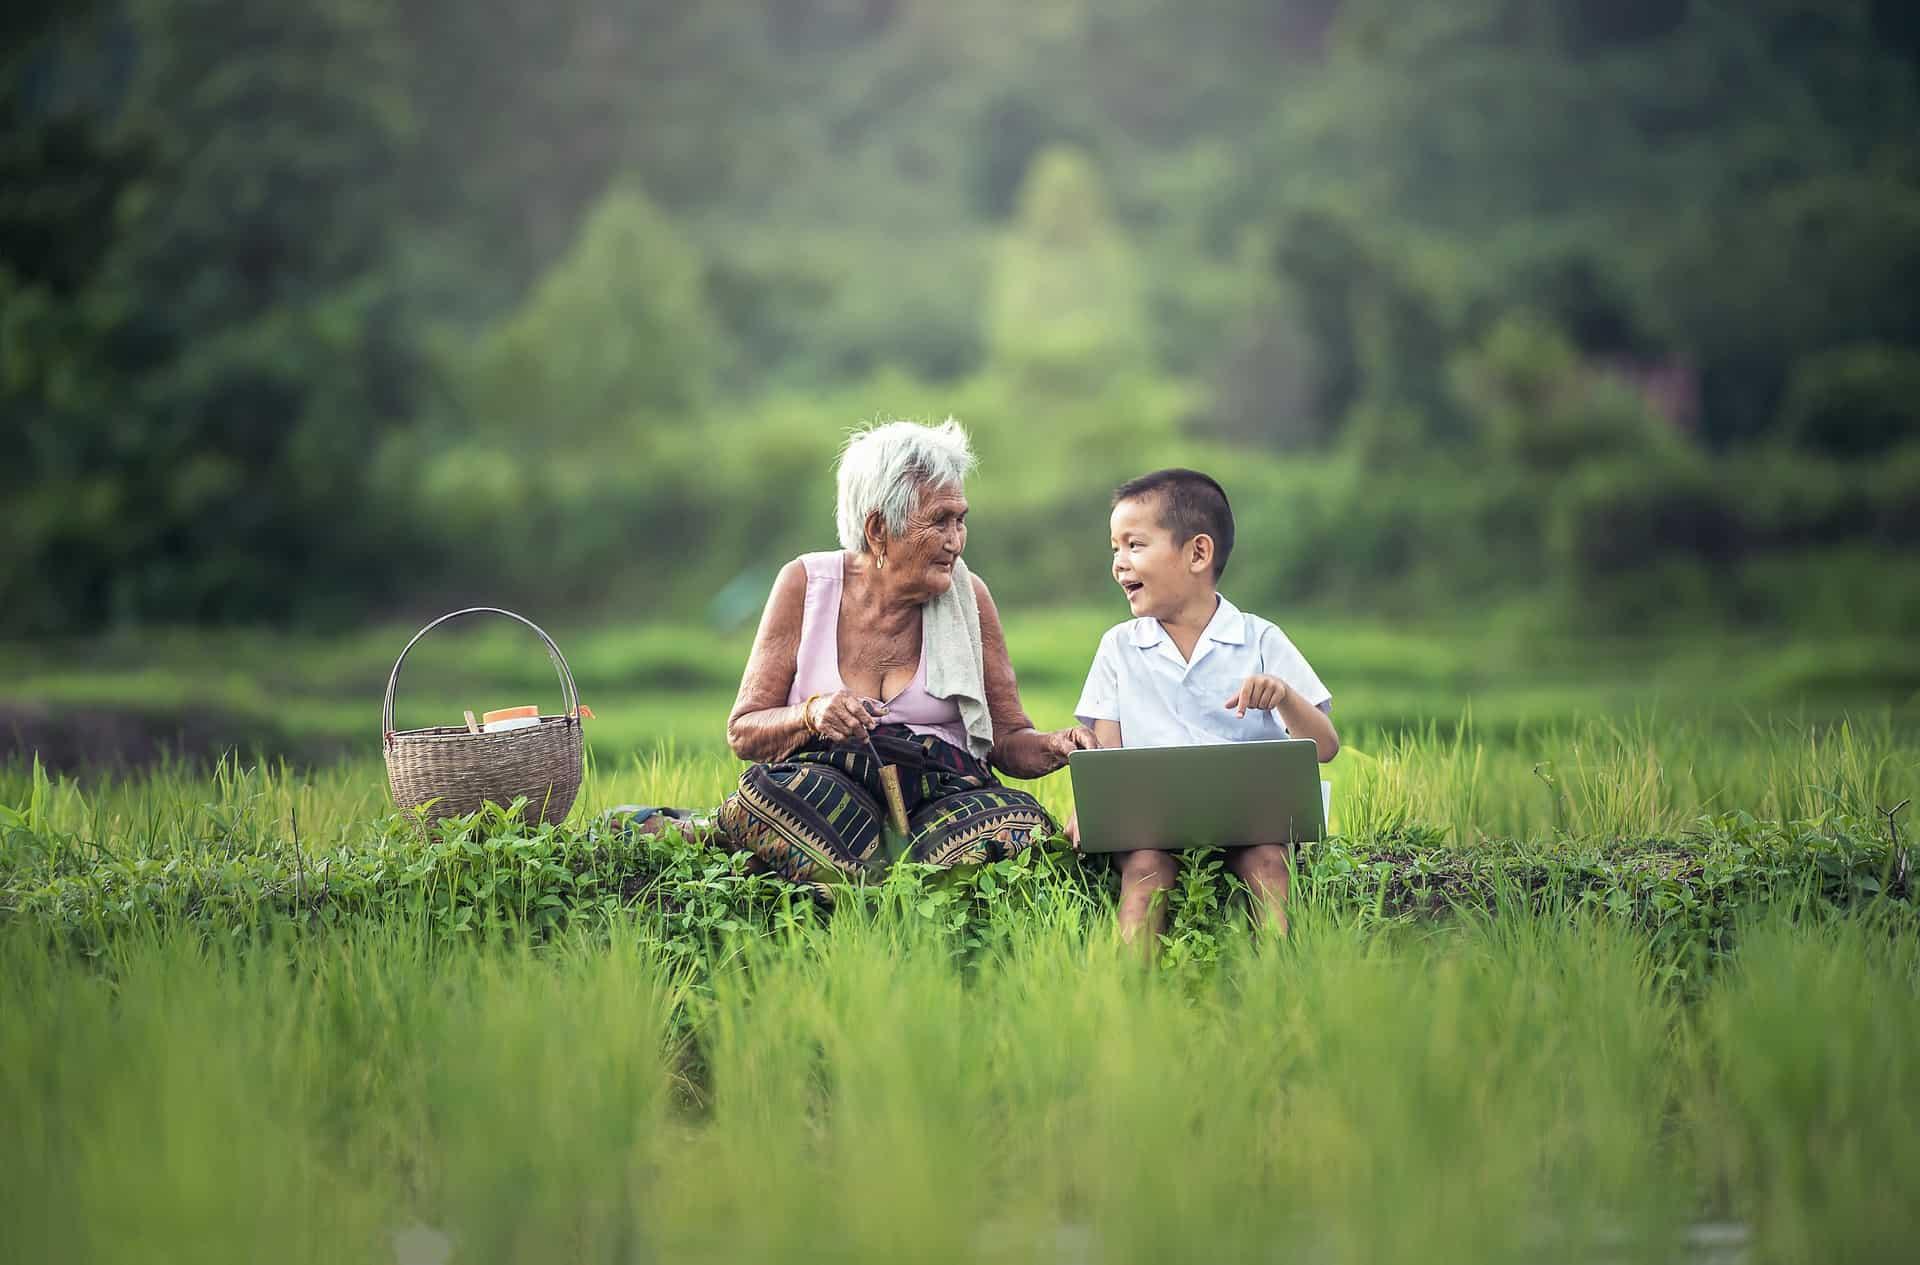 www.mydailyspanish.com Tú Usted Old Lady